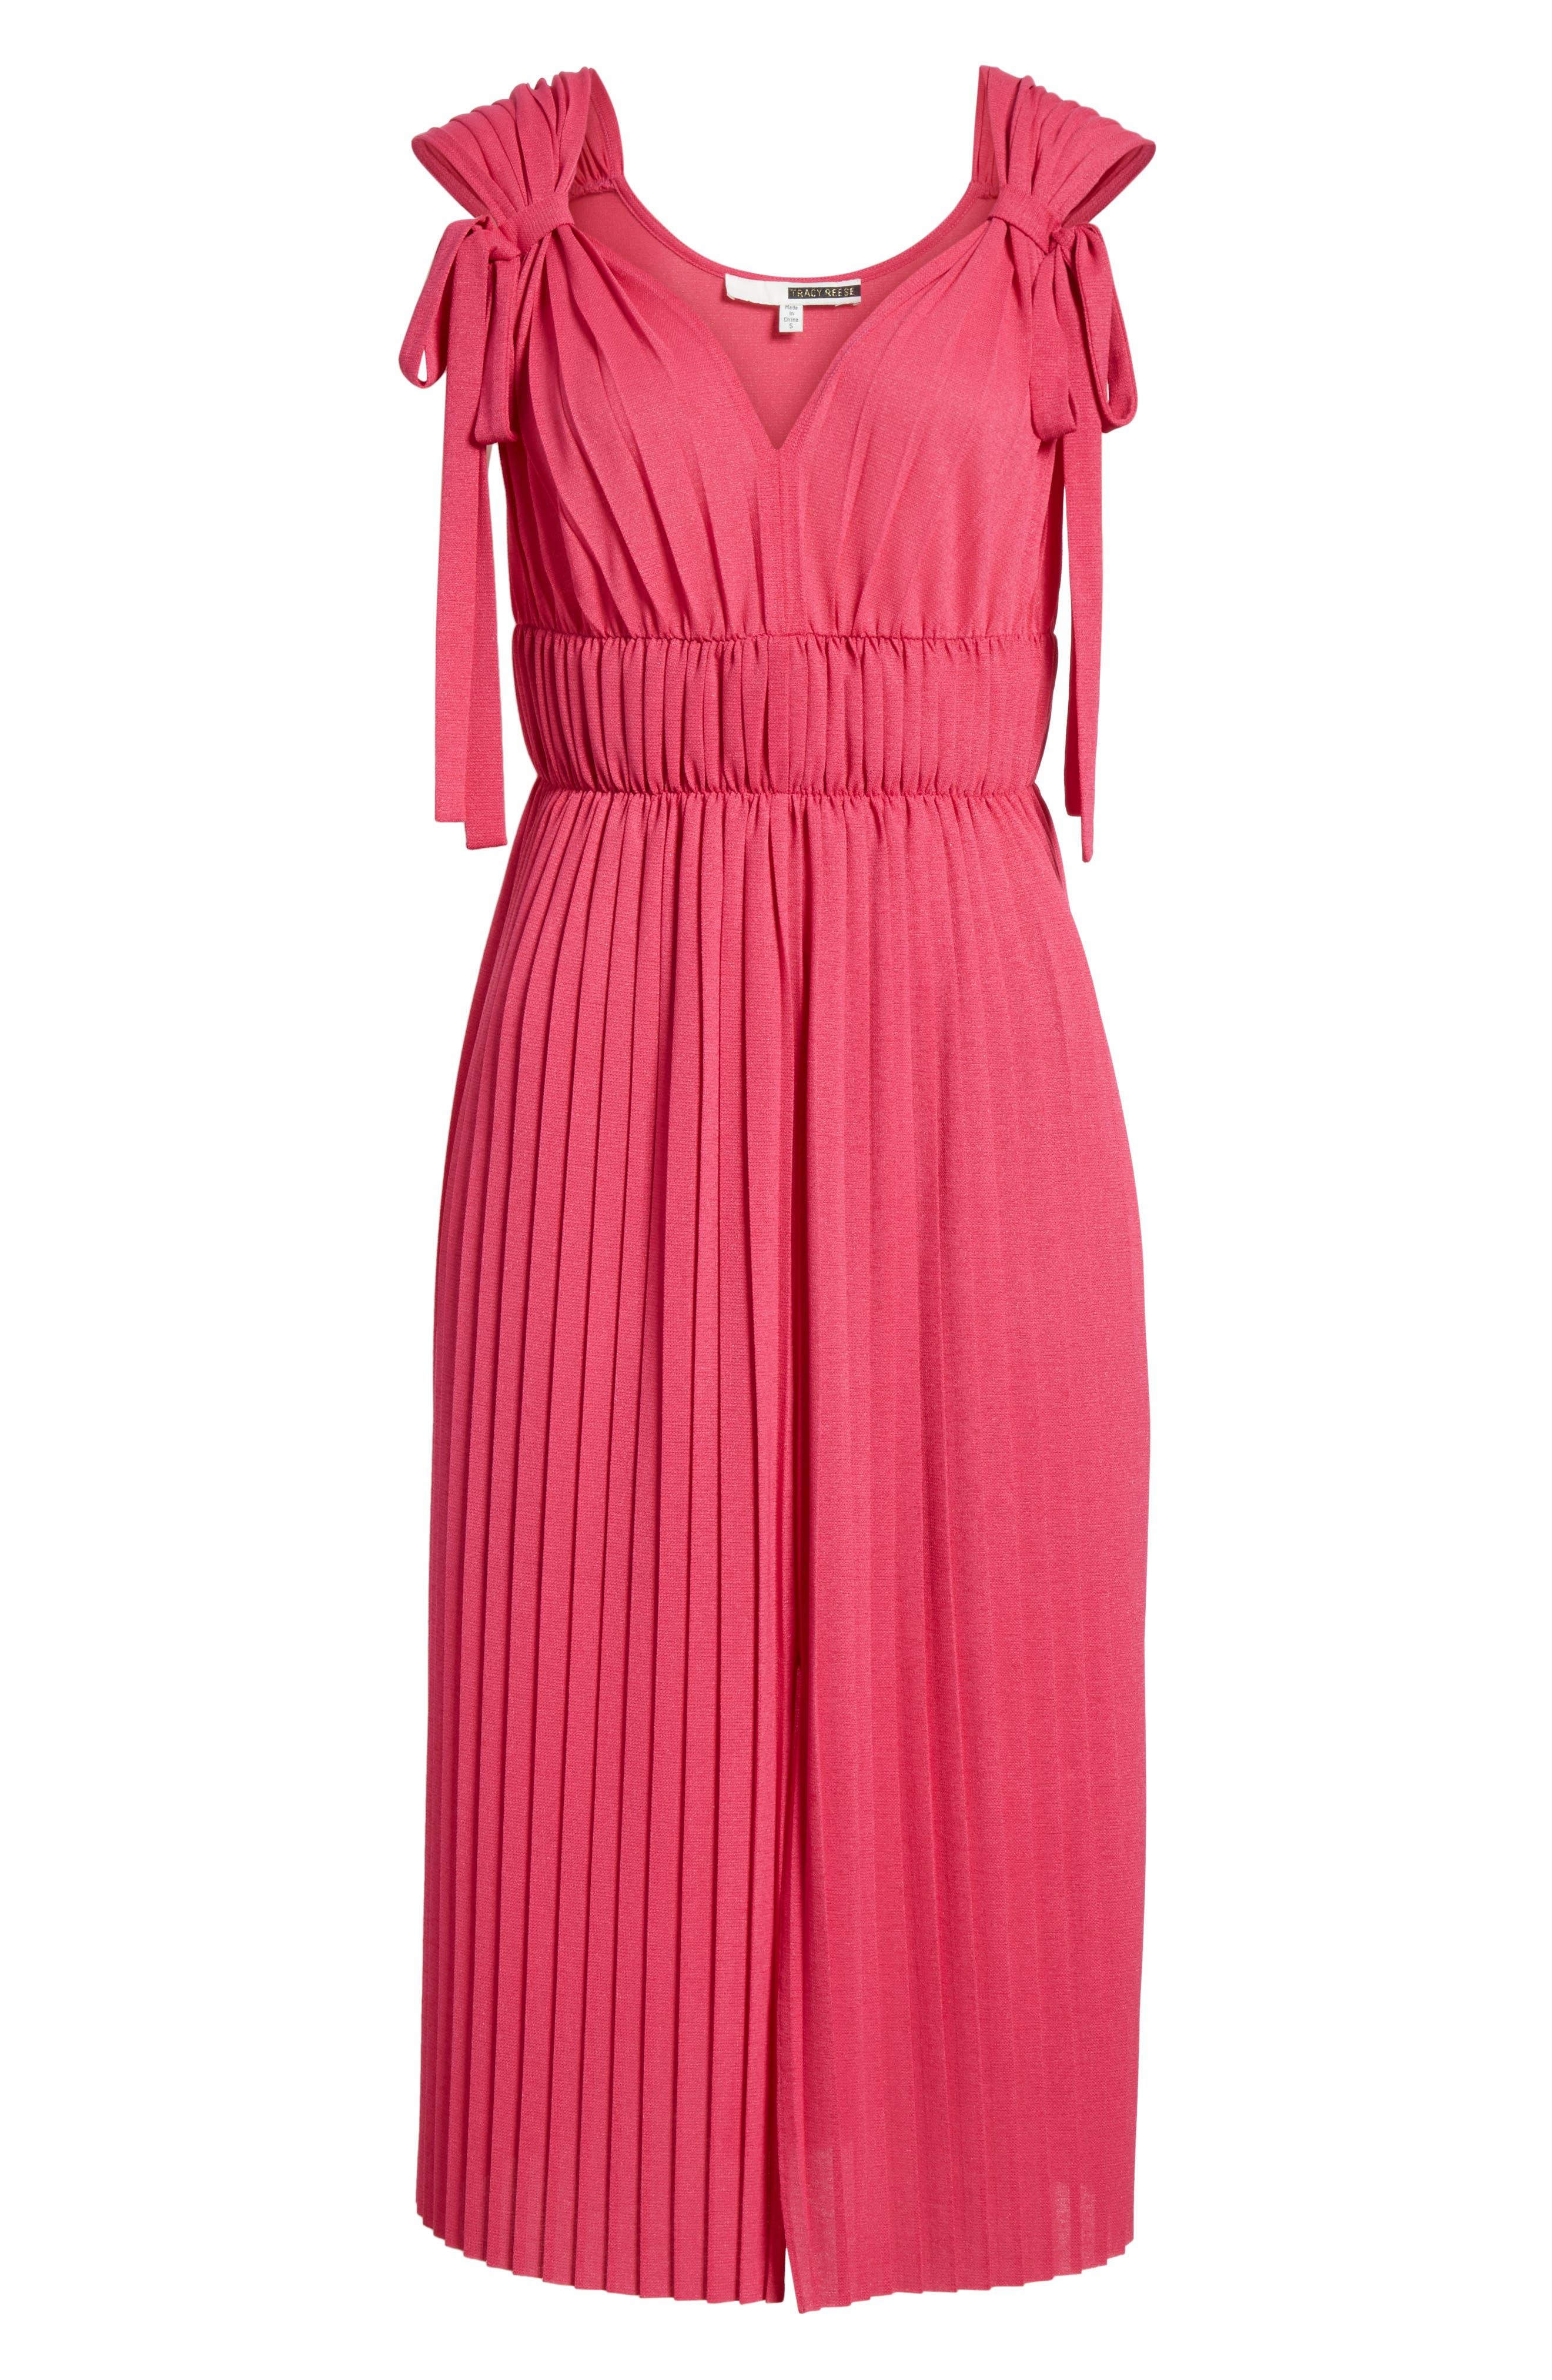 Grecian Pleat Dress,                             Alternate thumbnail 6, color,                             Cyclamen